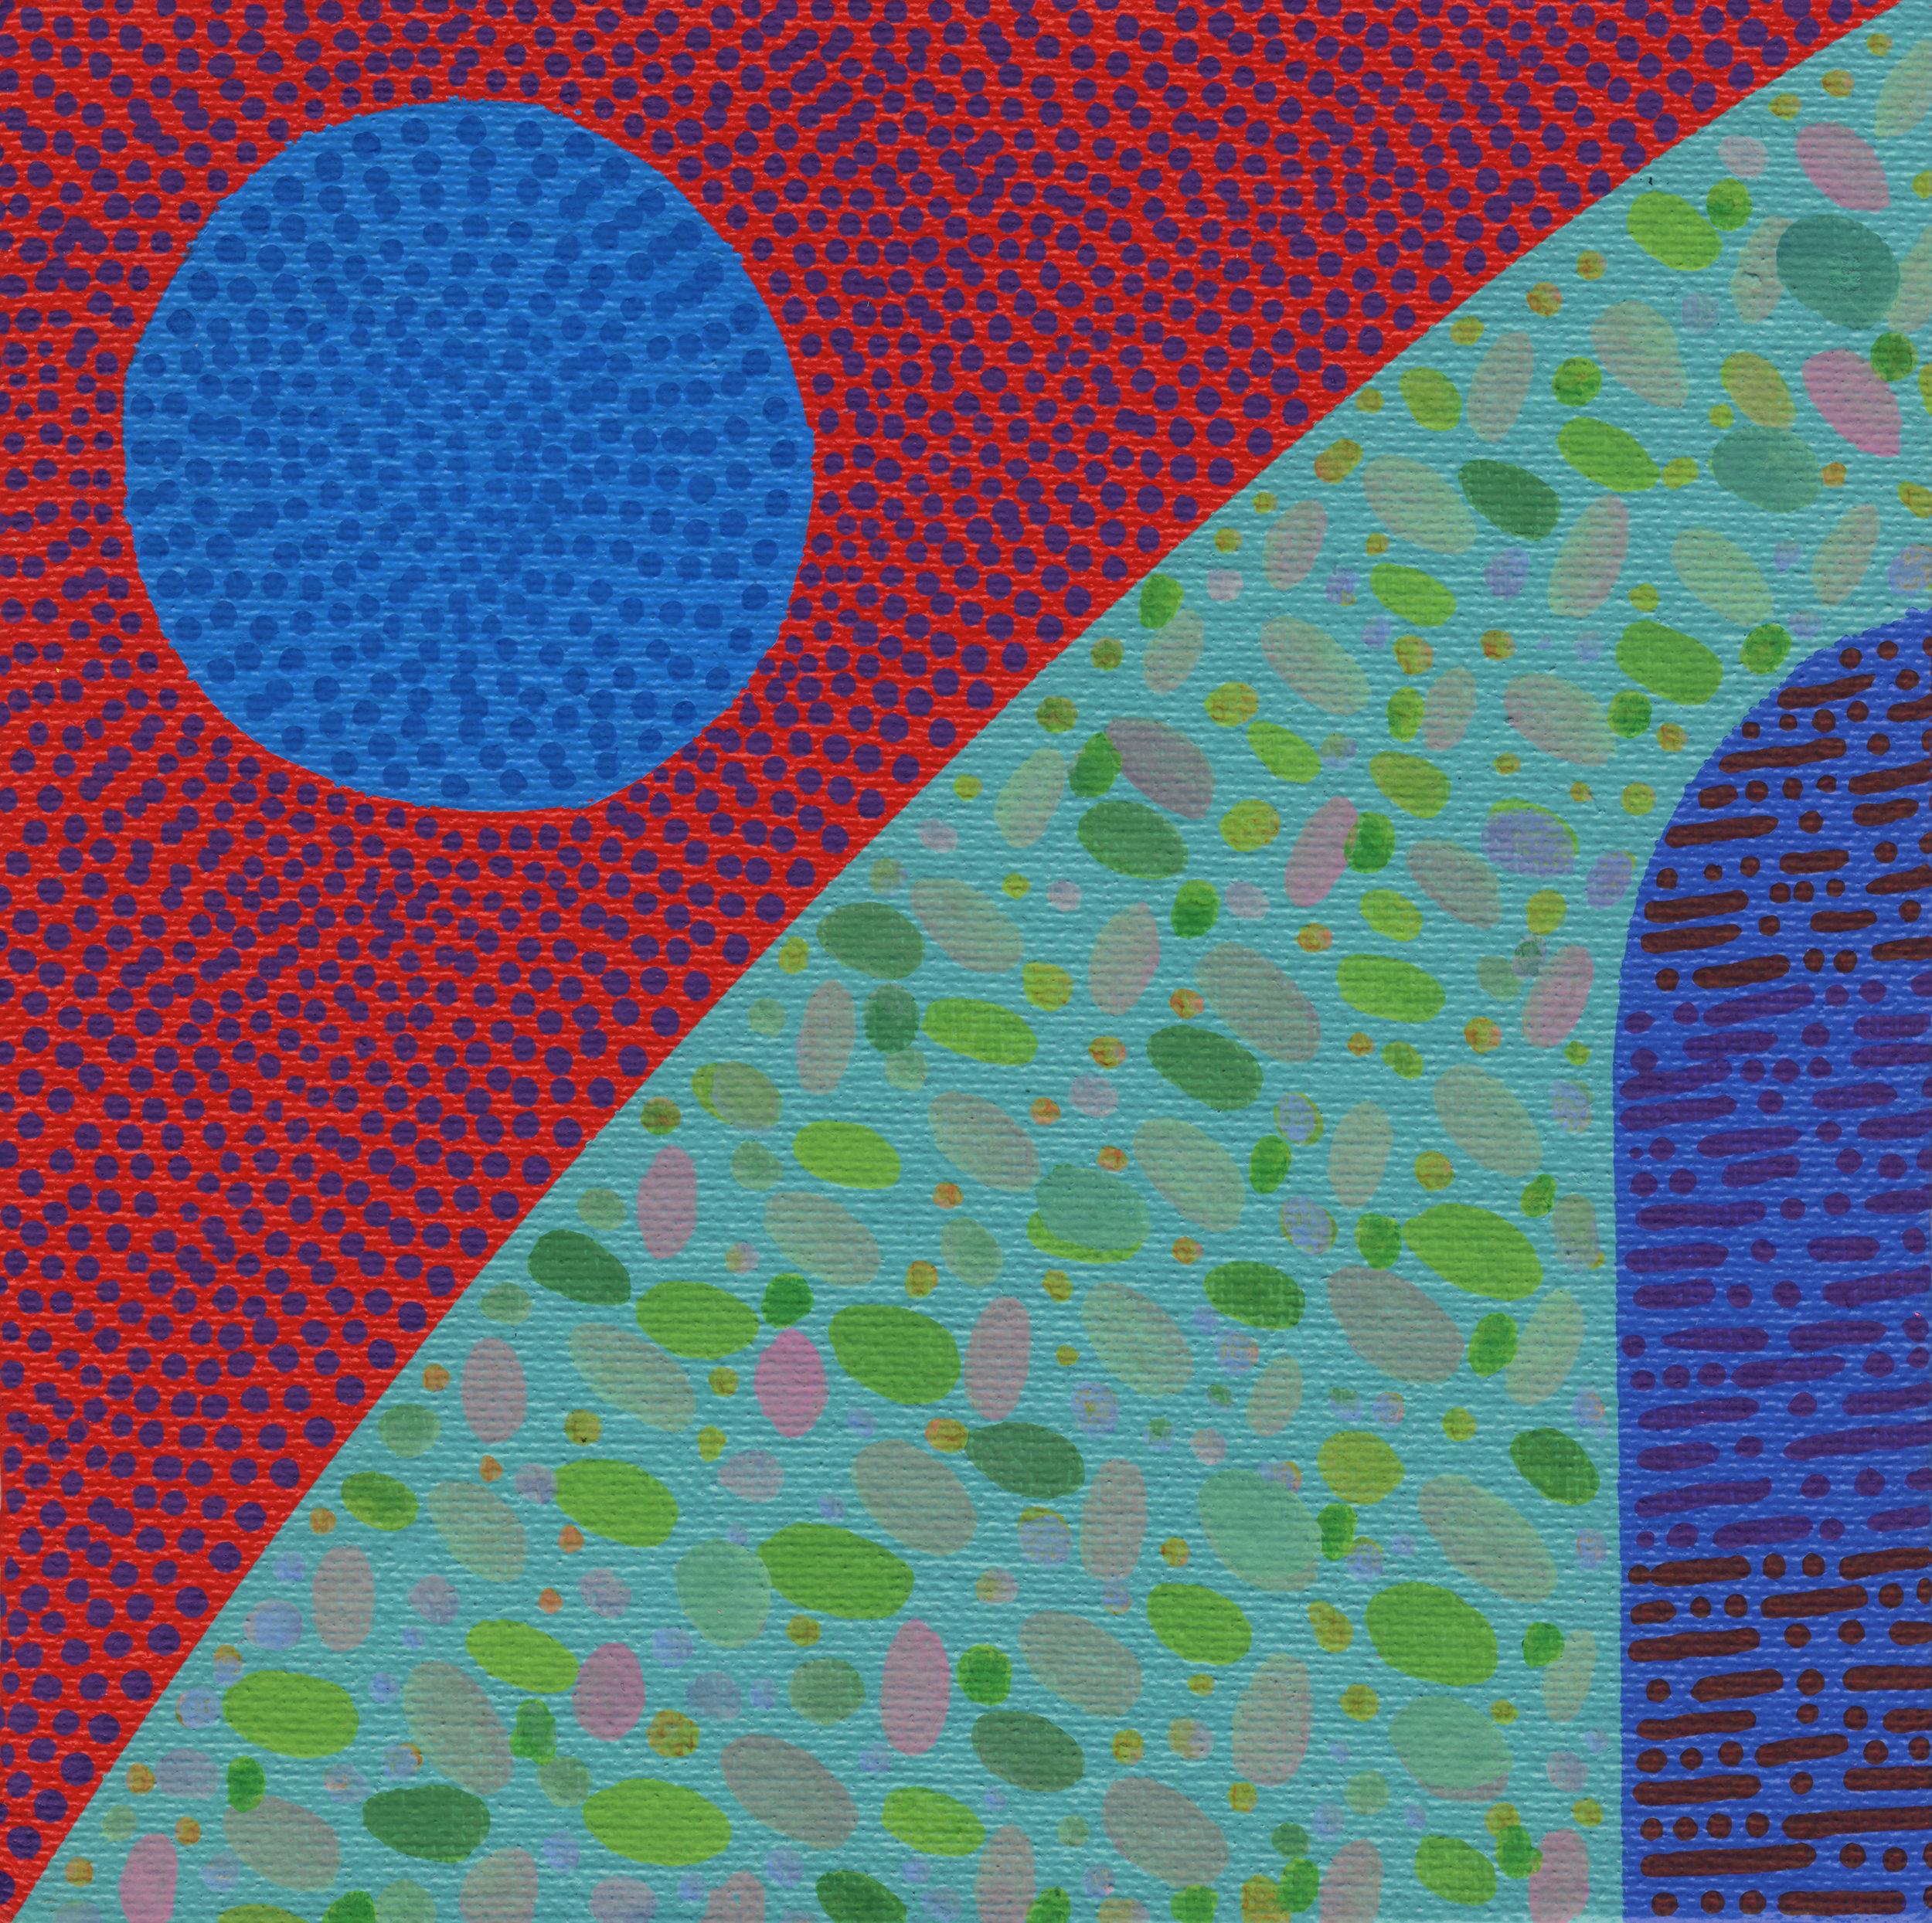 "74/100, Acrylic on canvas panel, 6"" X 6"", 3/21/19"